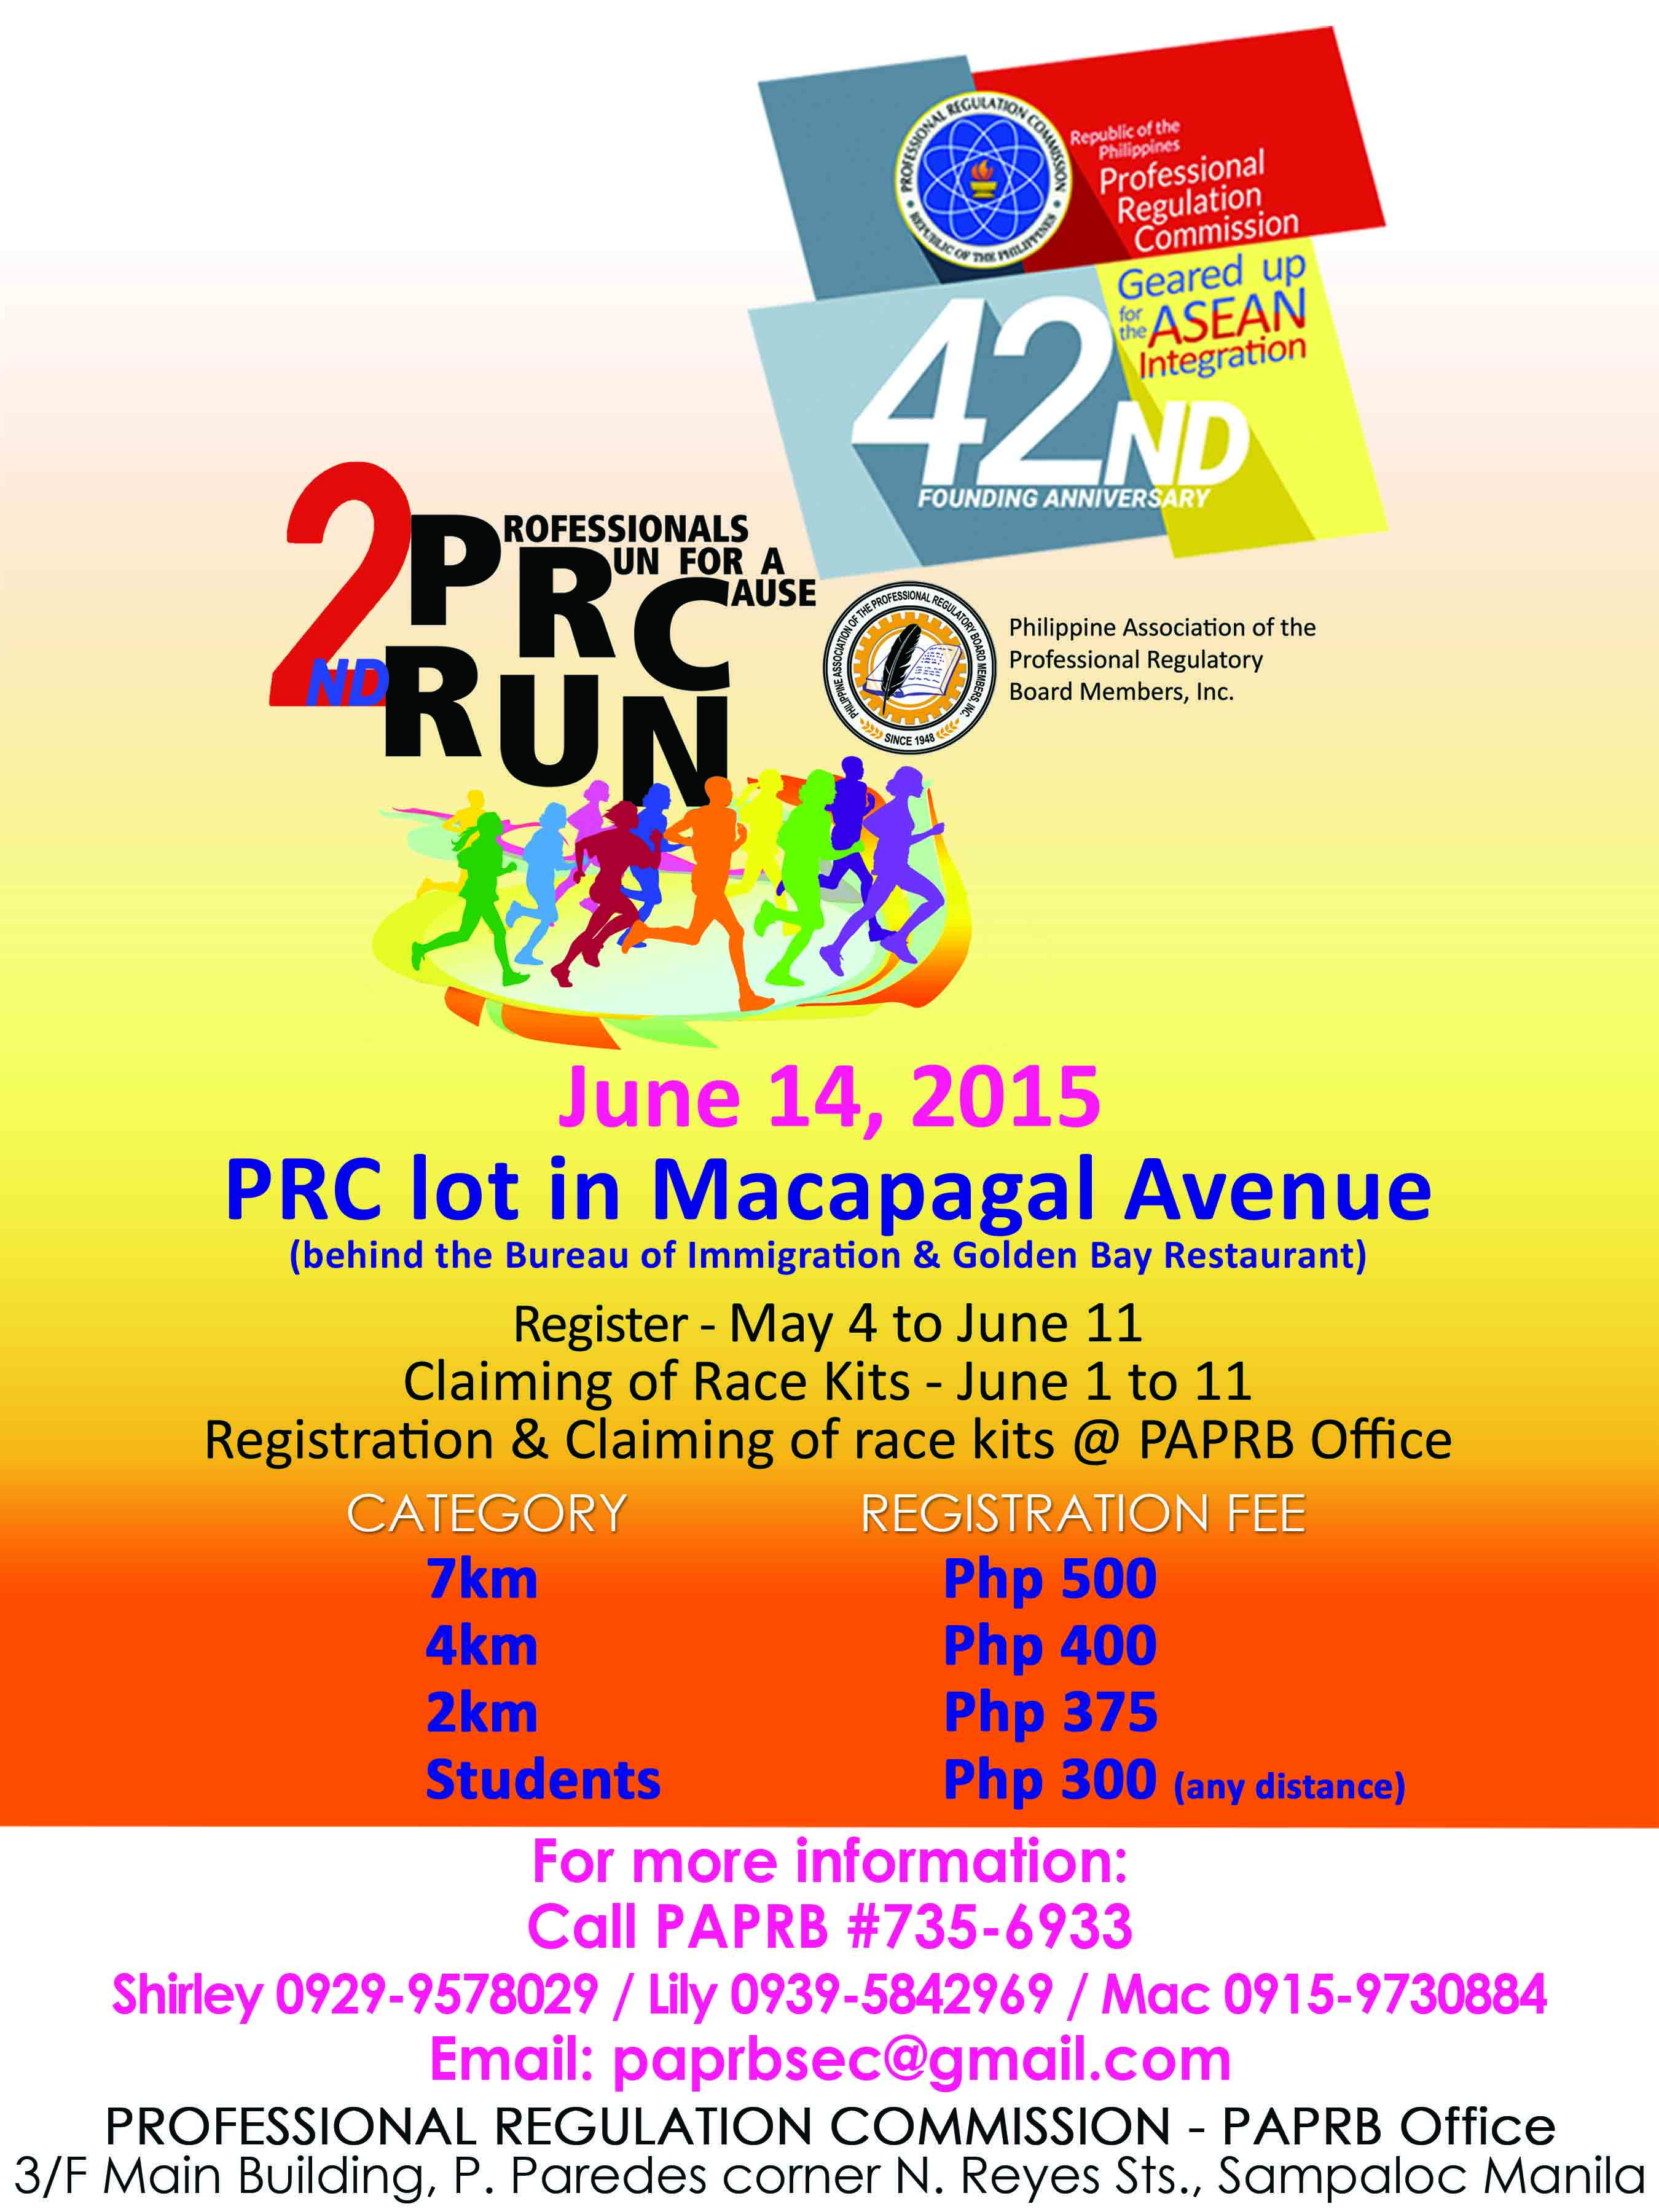 Prc Fun Run 2 2015 Macapagal Avenue Registration Singlet Map